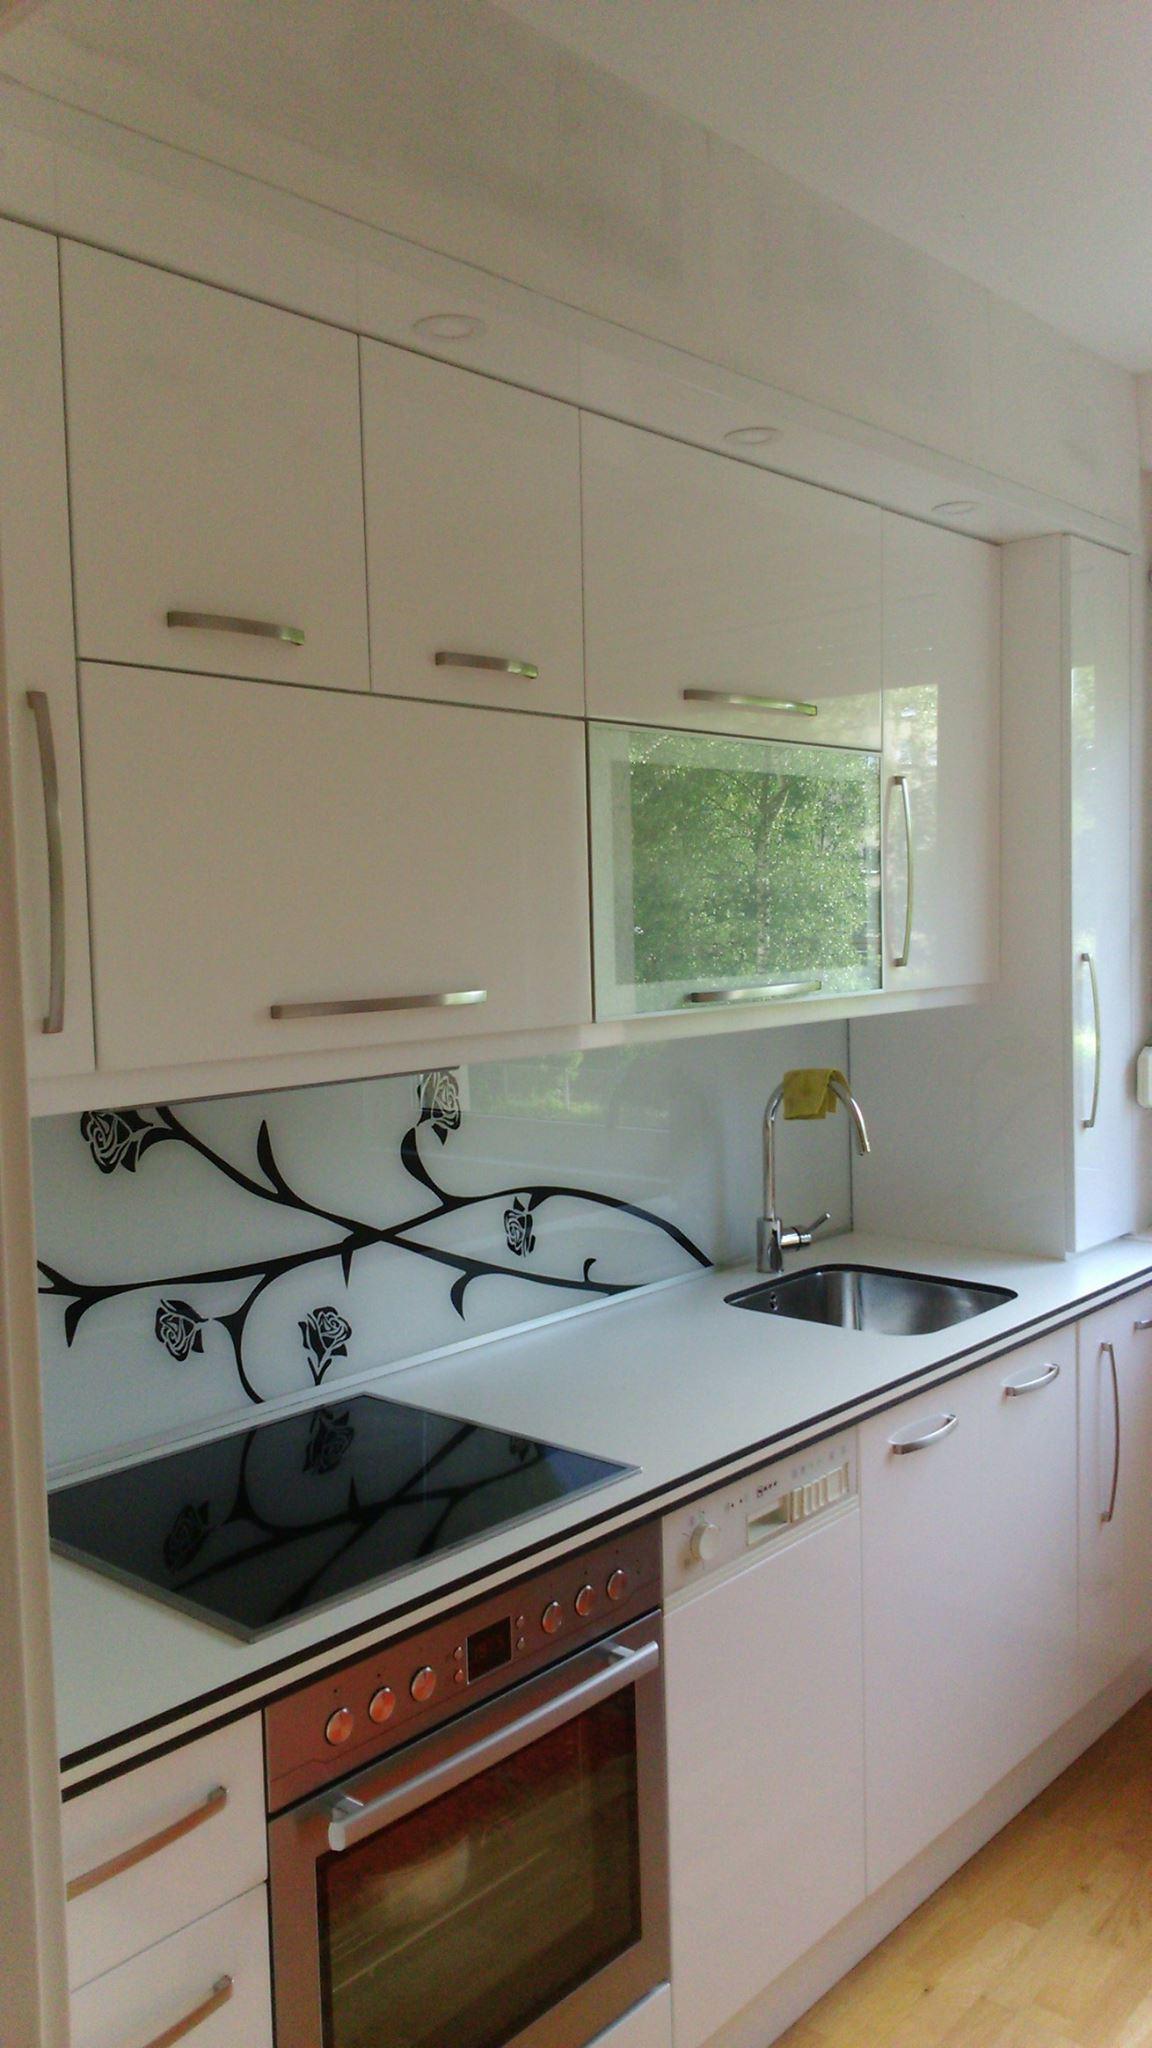 kuhinje po mjeri hercegovina 20170819204242 zanimljive ideje za dizajn svoj. Black Bedroom Furniture Sets. Home Design Ideas